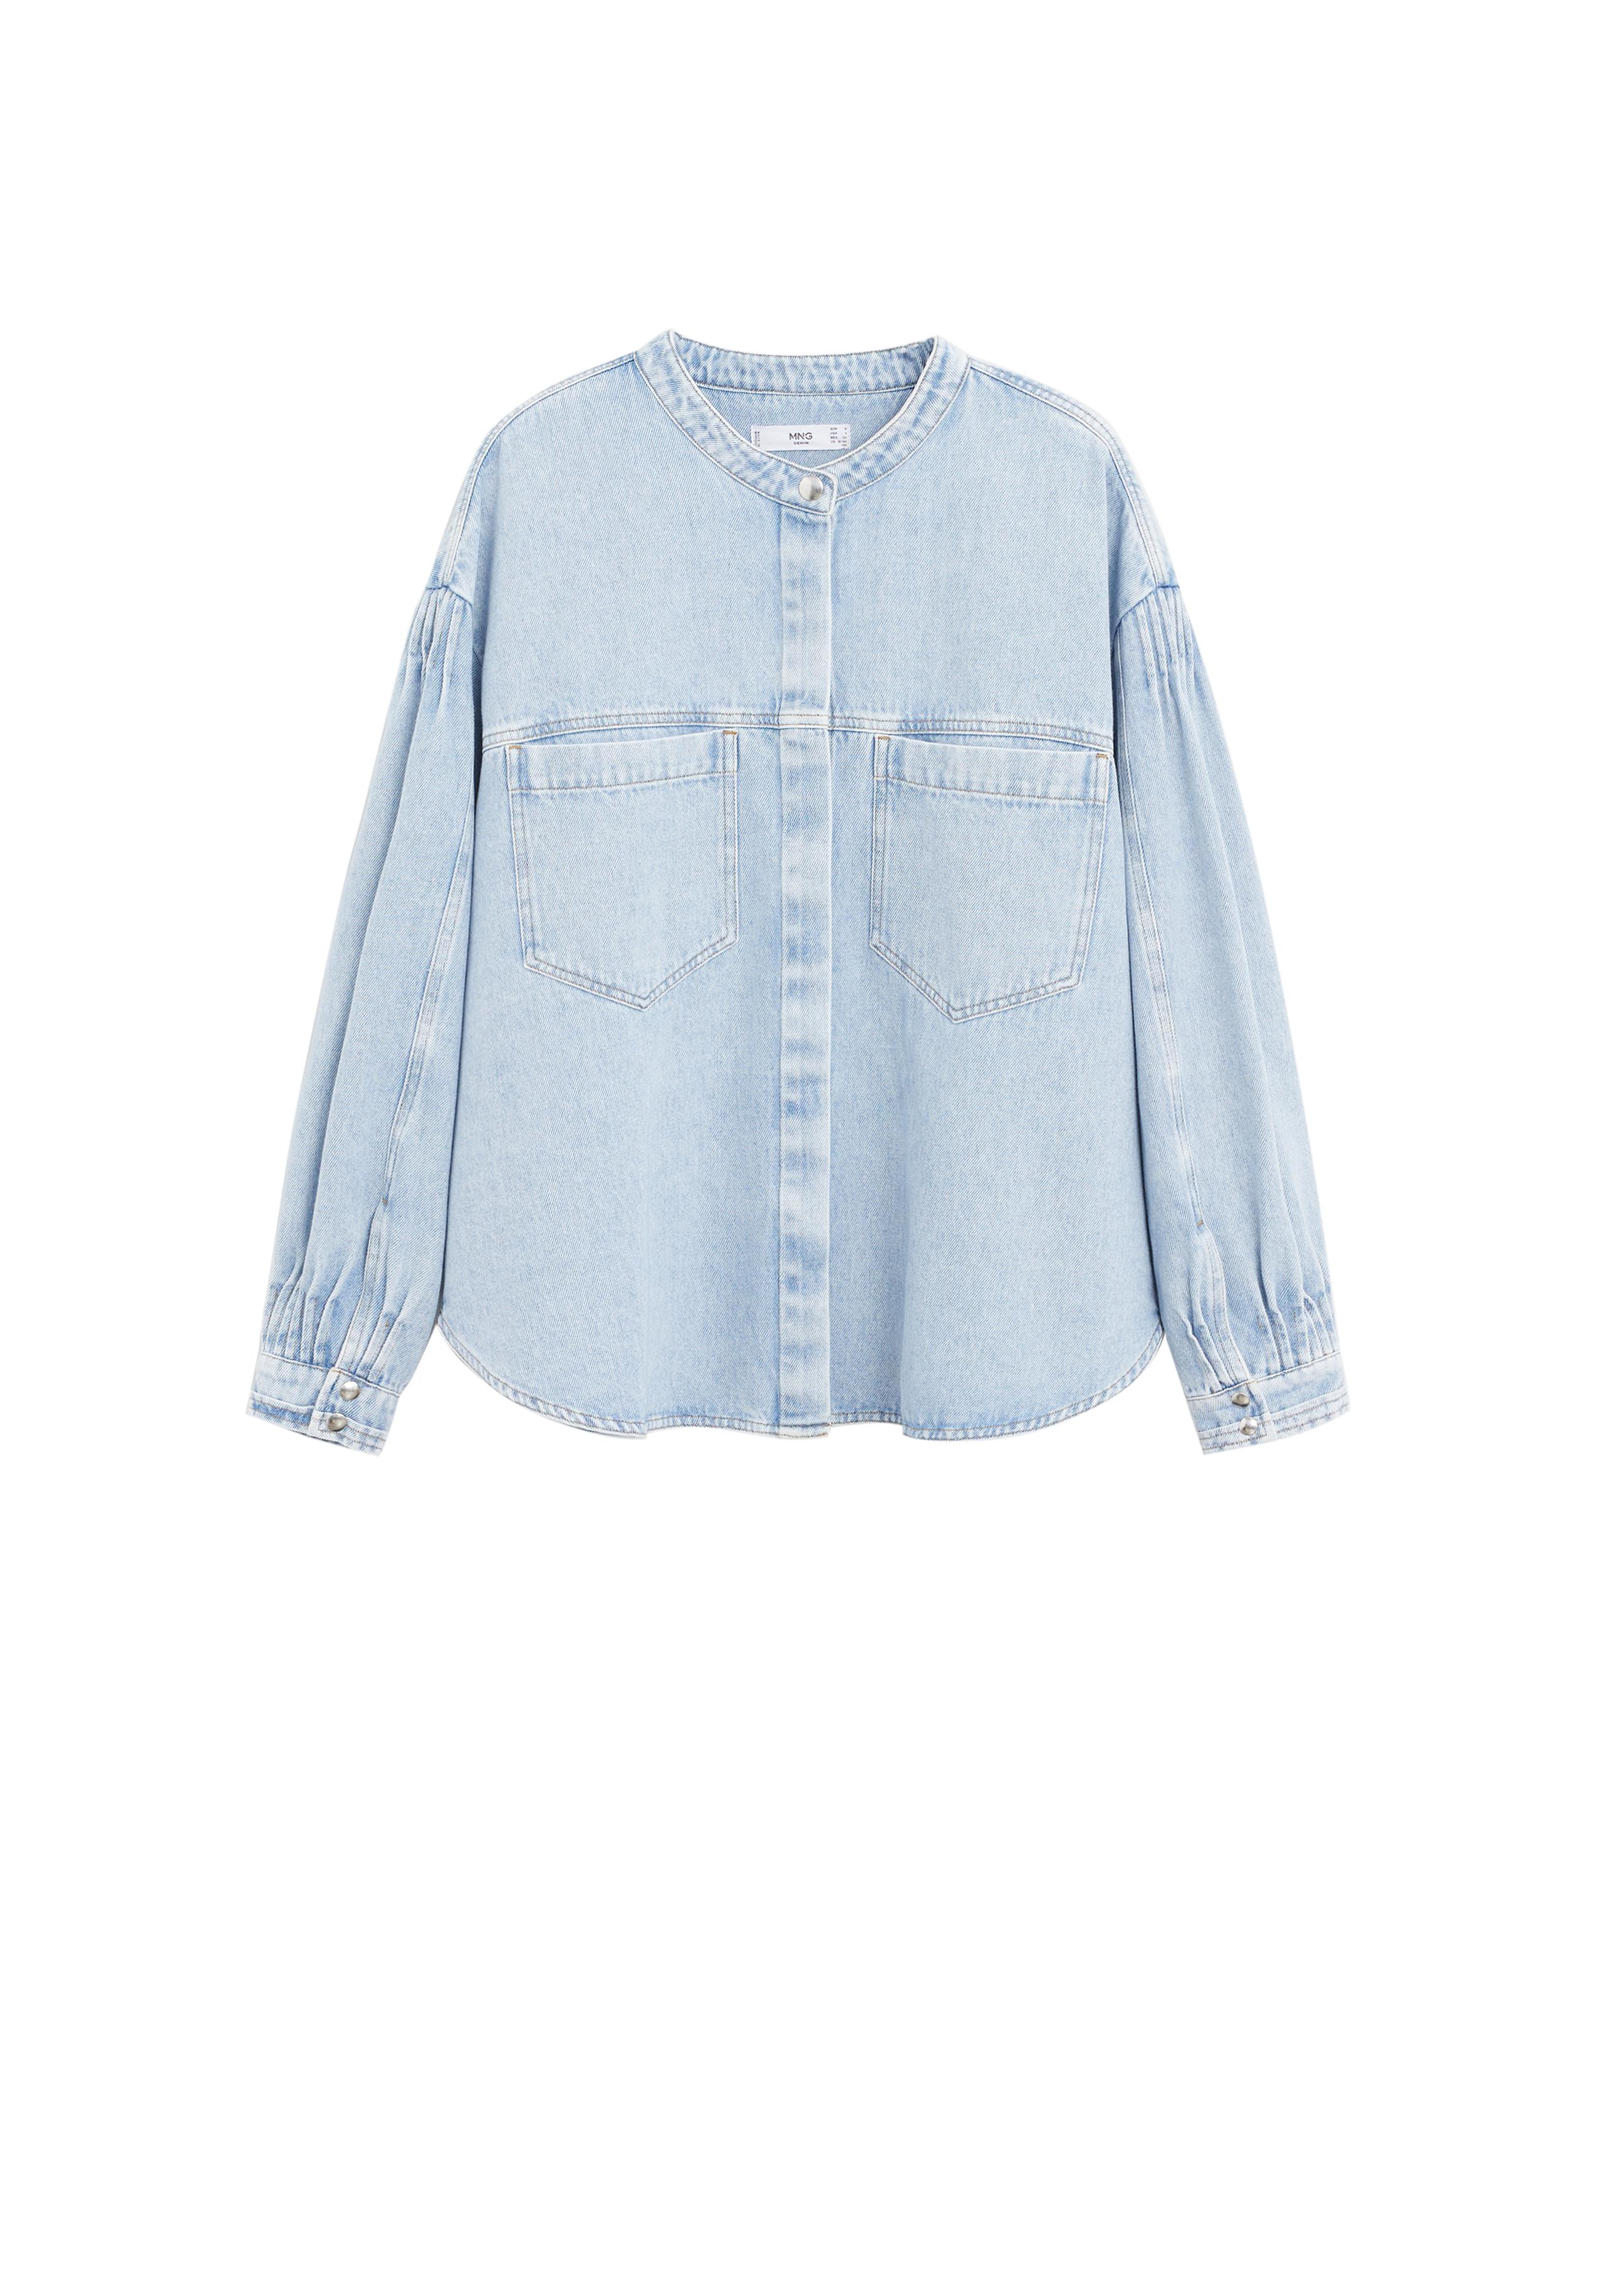 MANGO. Puffed Sleeves Denim ShirtAED269